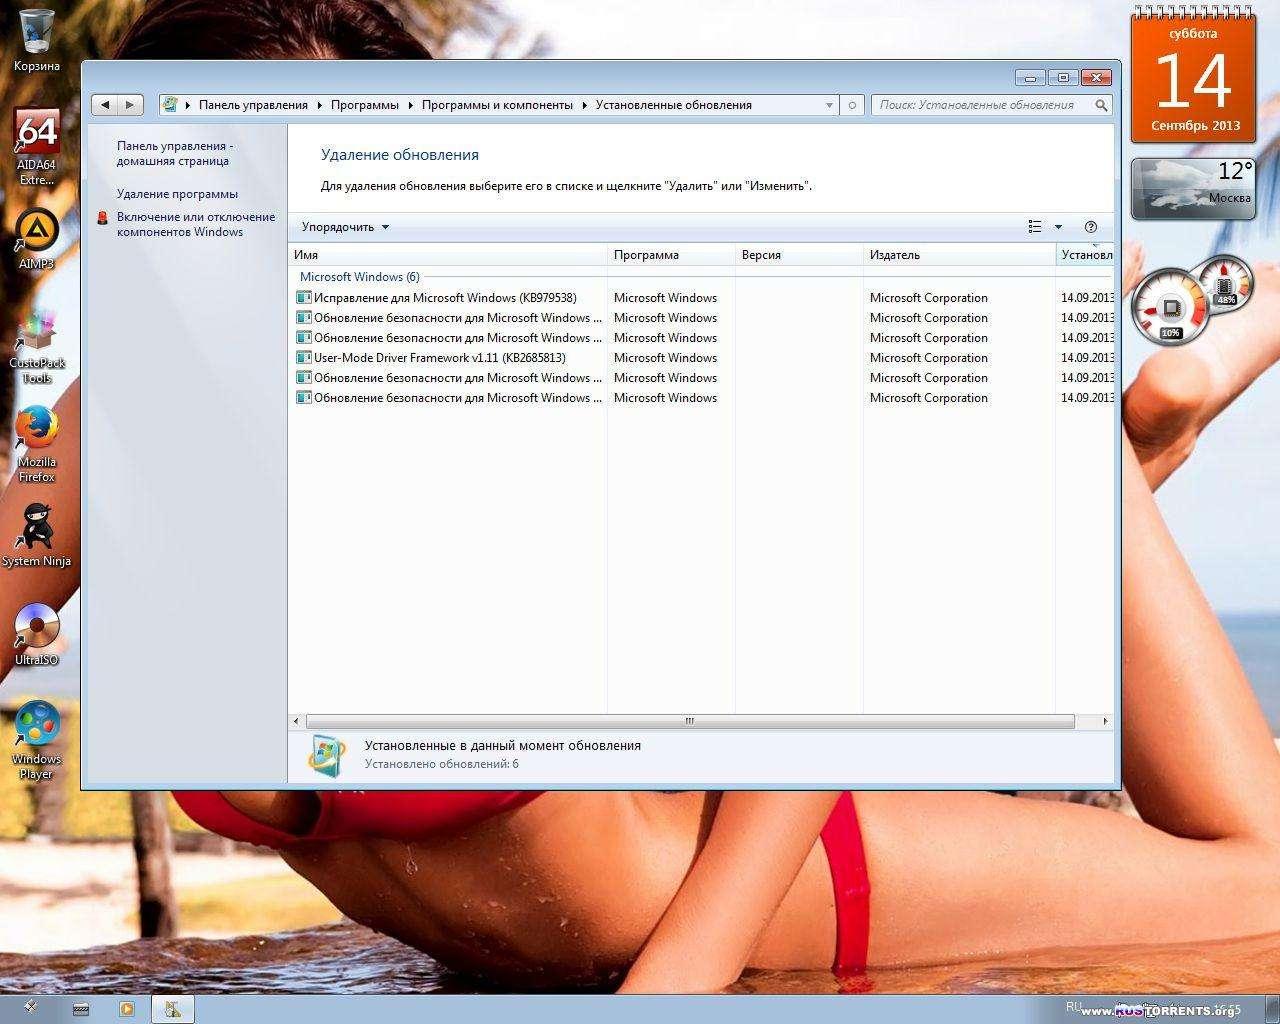 Windows 7 x64 Максимальная v3.13 by STAD1 RUS